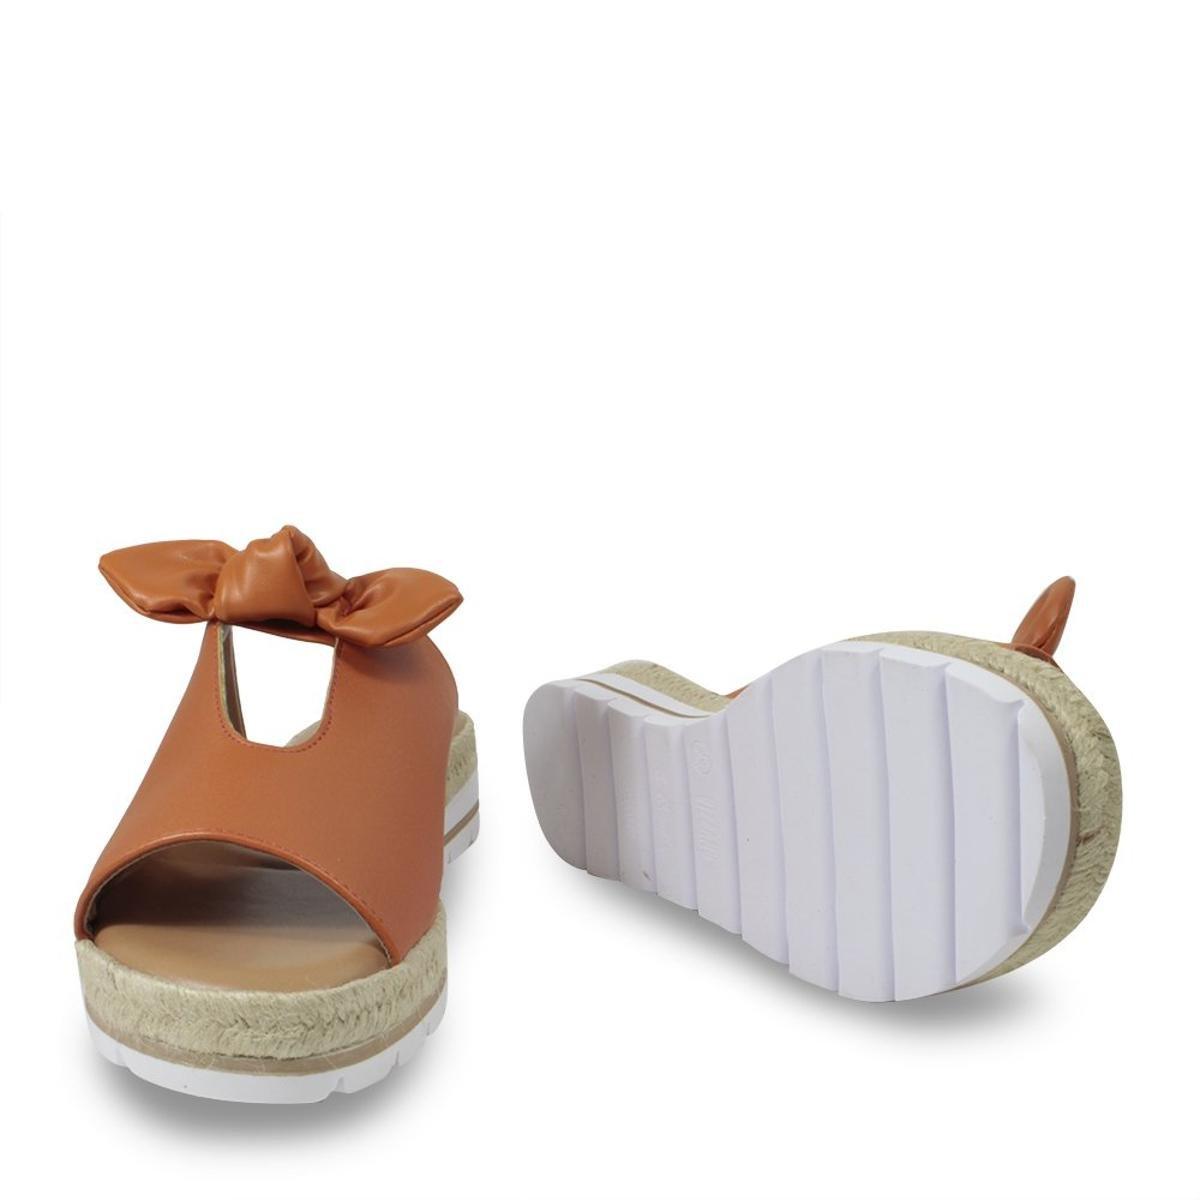 Slide Vizzano Flatform Laço Feminino - Caramelo